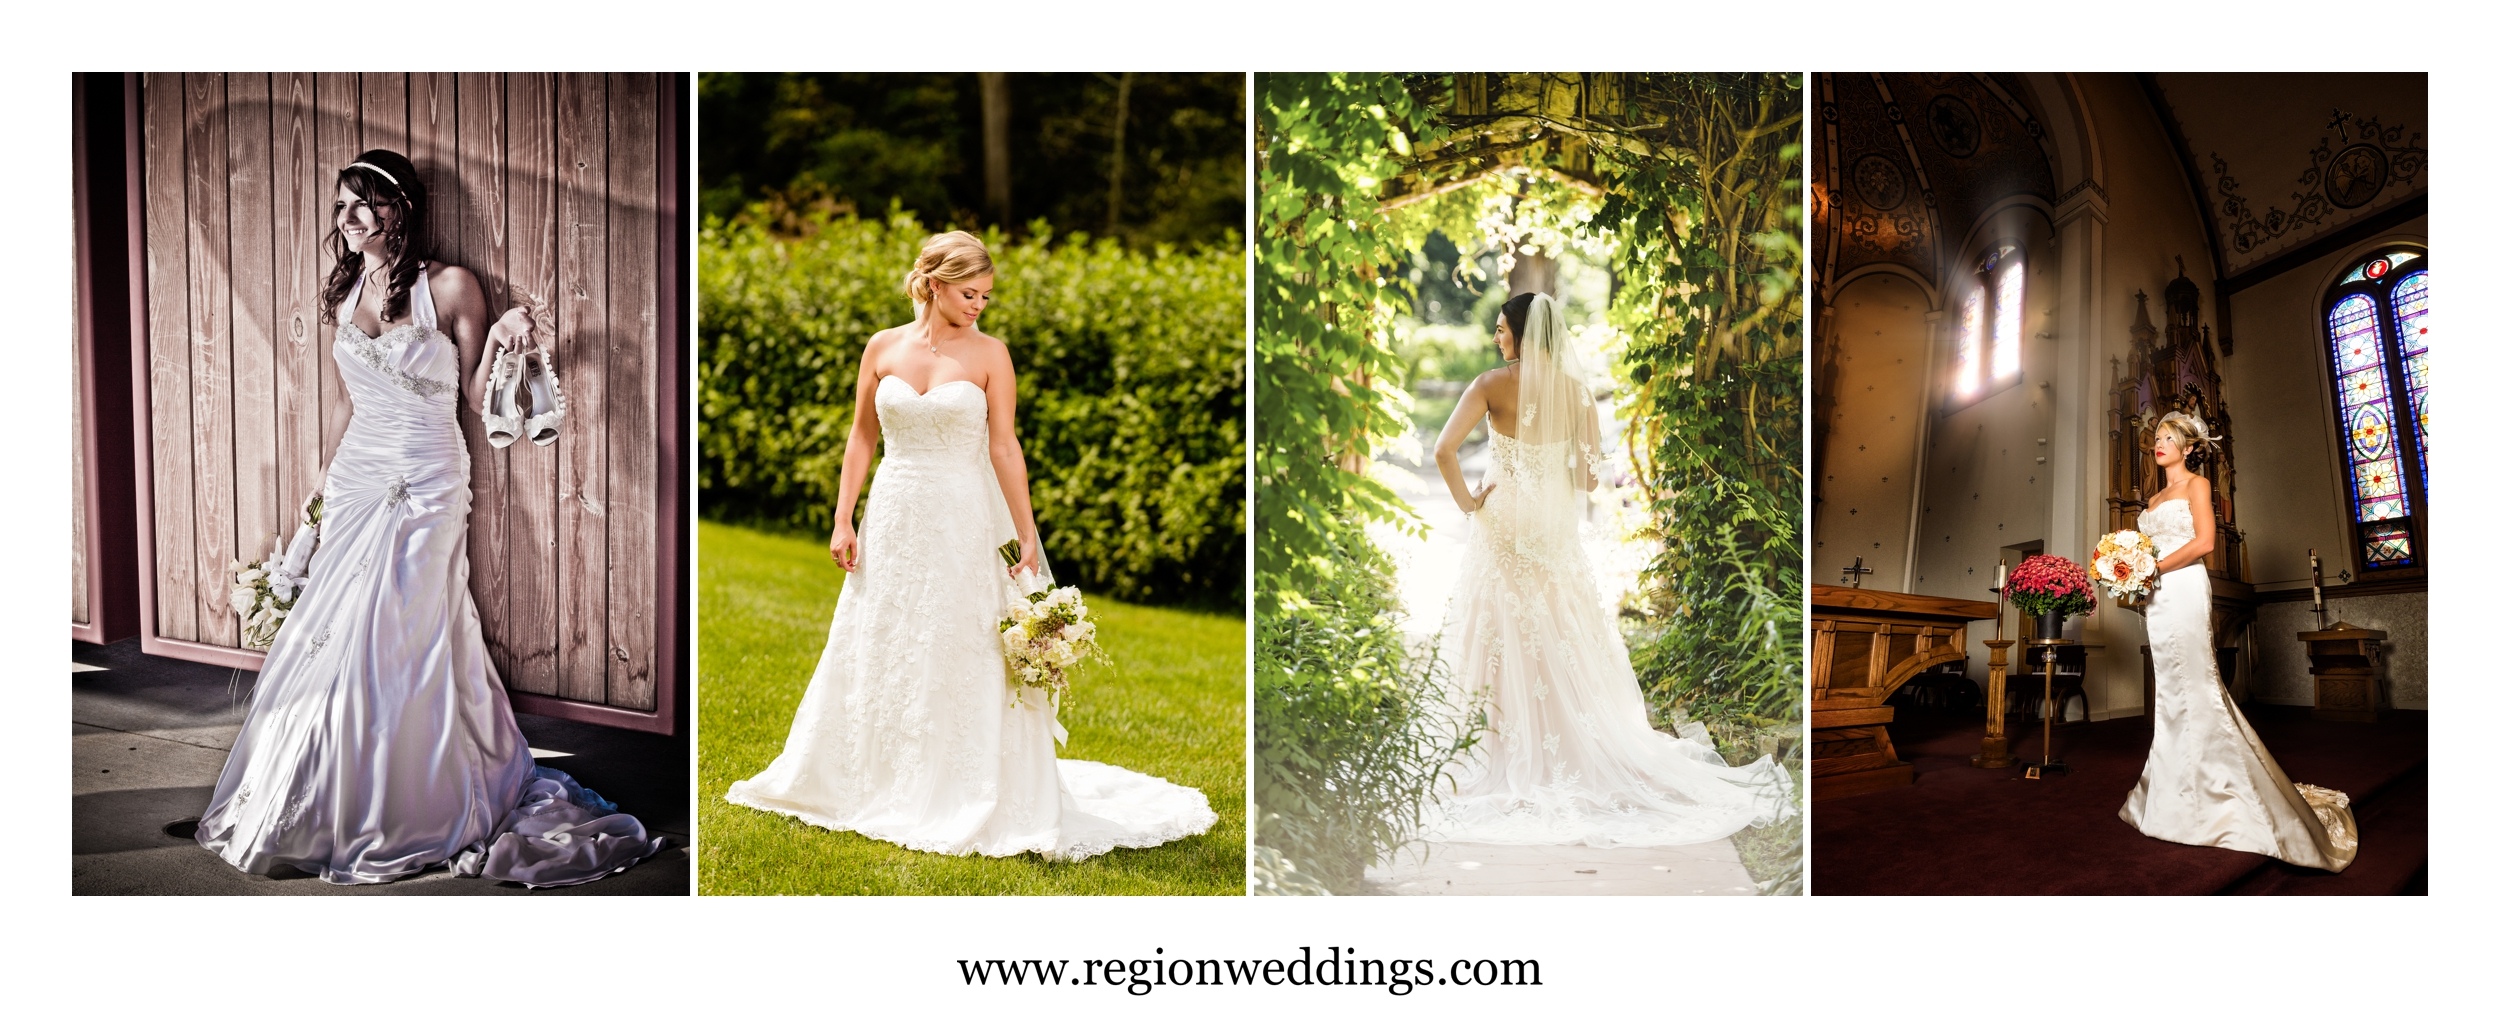 region-weddings-brides-photo-collage.jpg